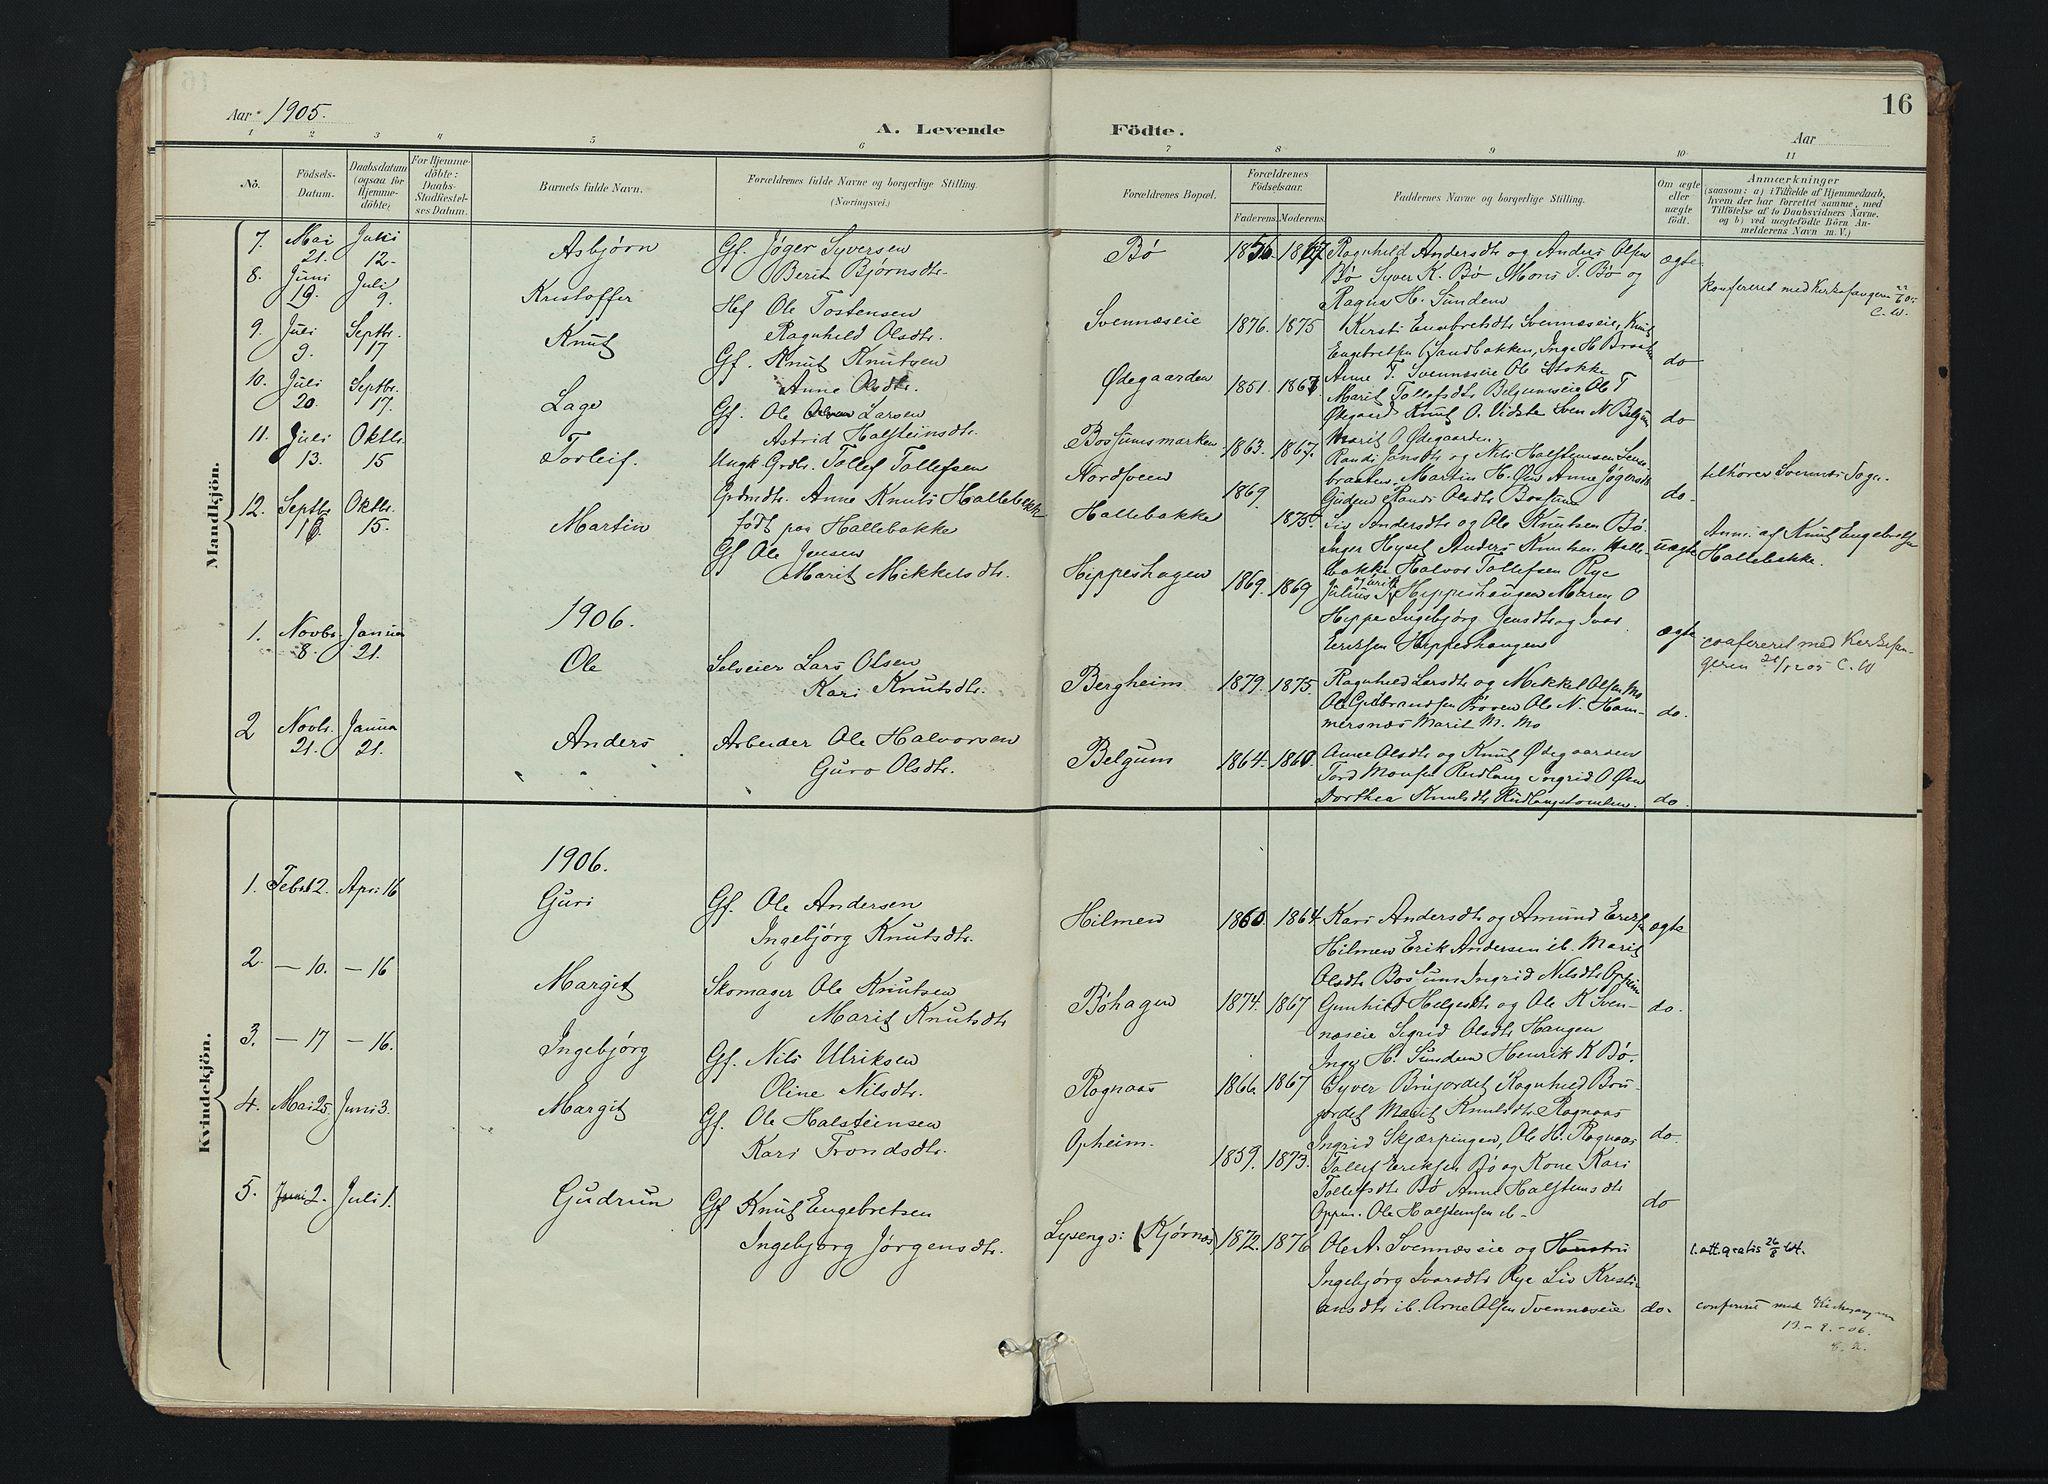 SAH, Nord-Aurdal prestekontor, Ministerialbok nr. 17, 1897-1926, s. 16